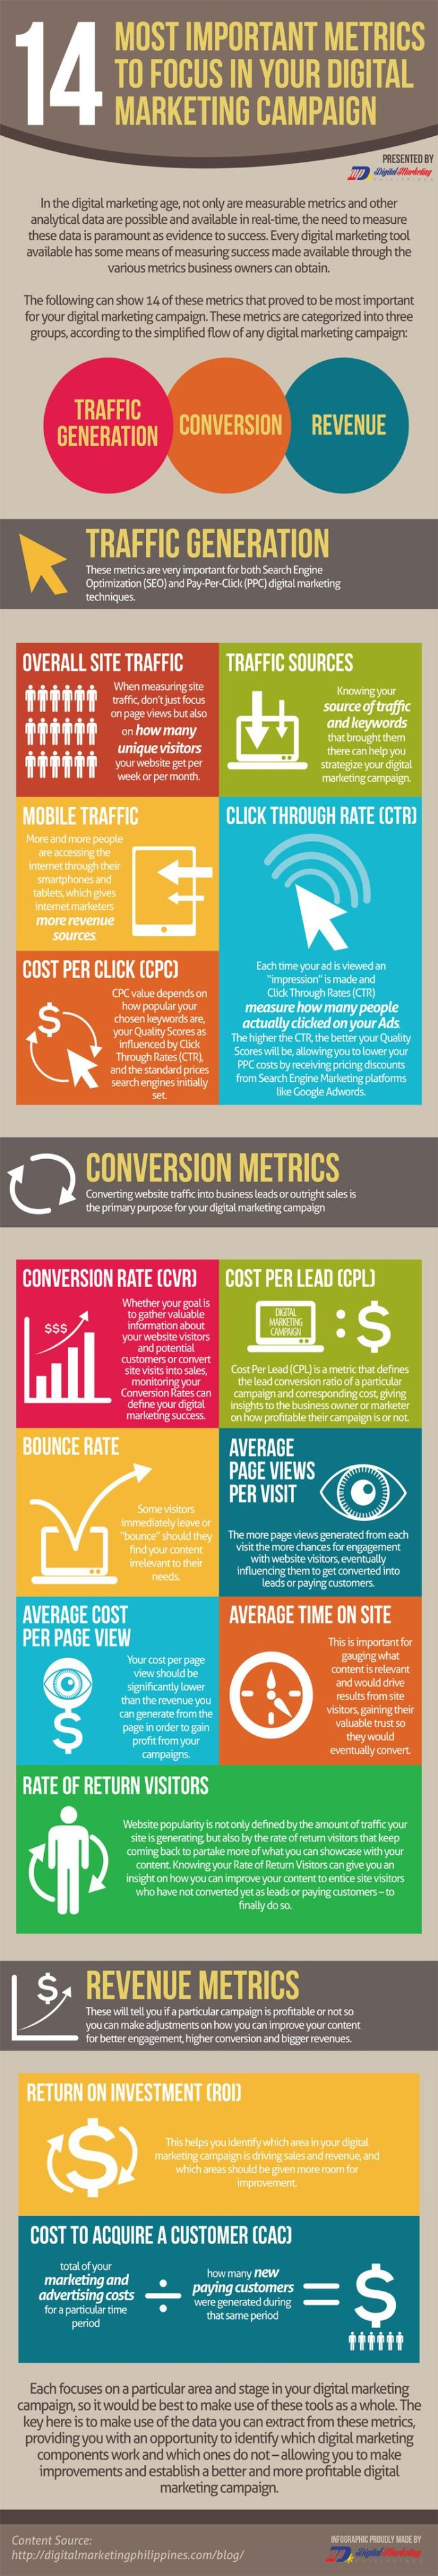 most important digital marketing metrics